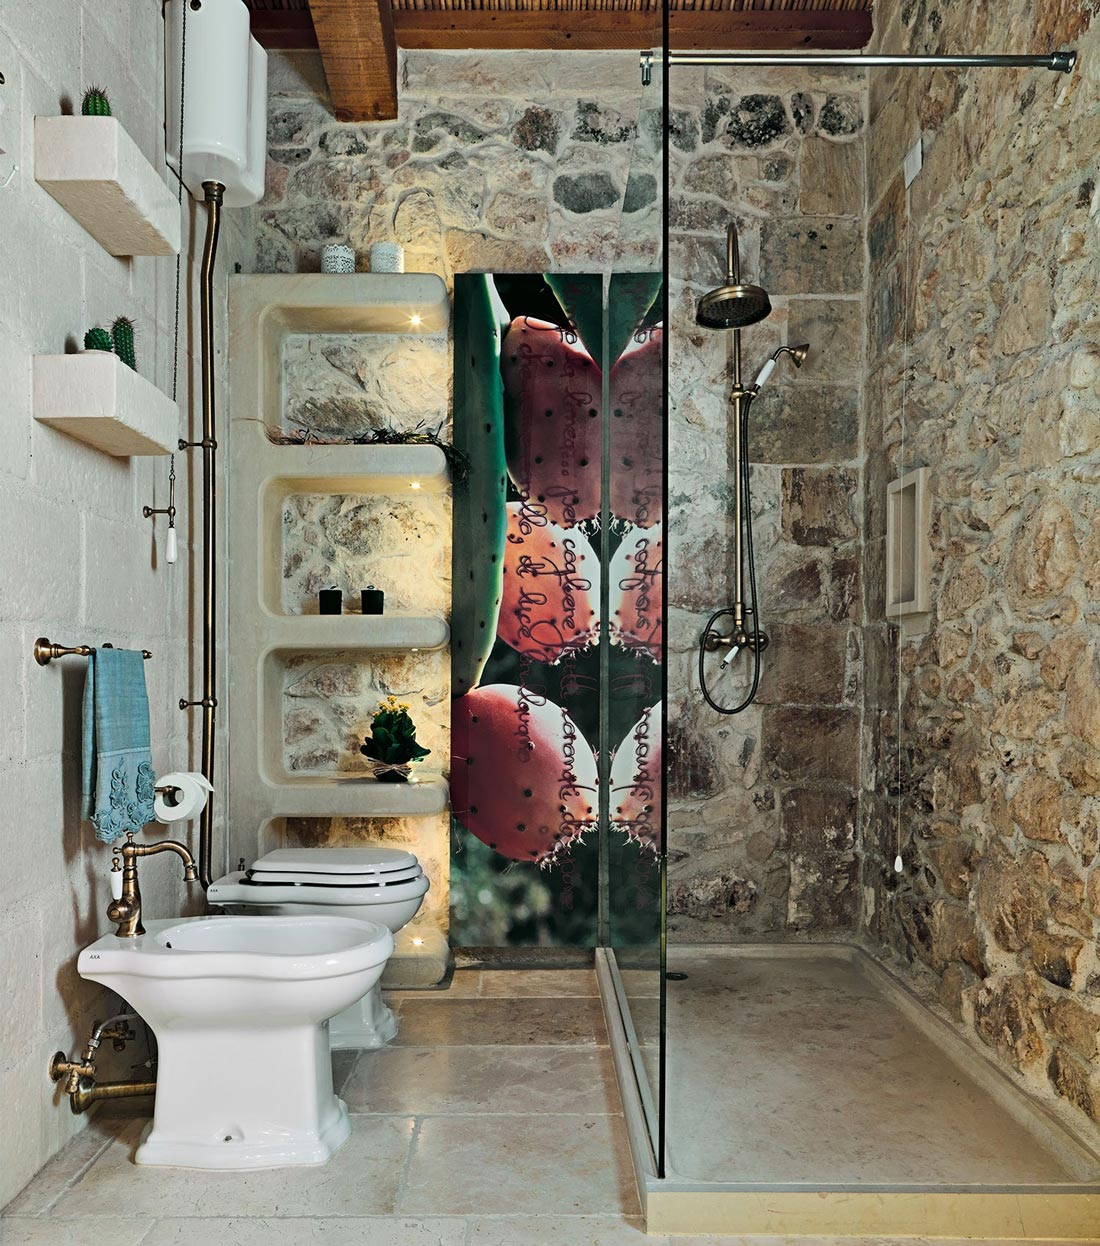 Glass Shower, Shelves, Relais Masseria Capasa Hotel in Martano, Italy